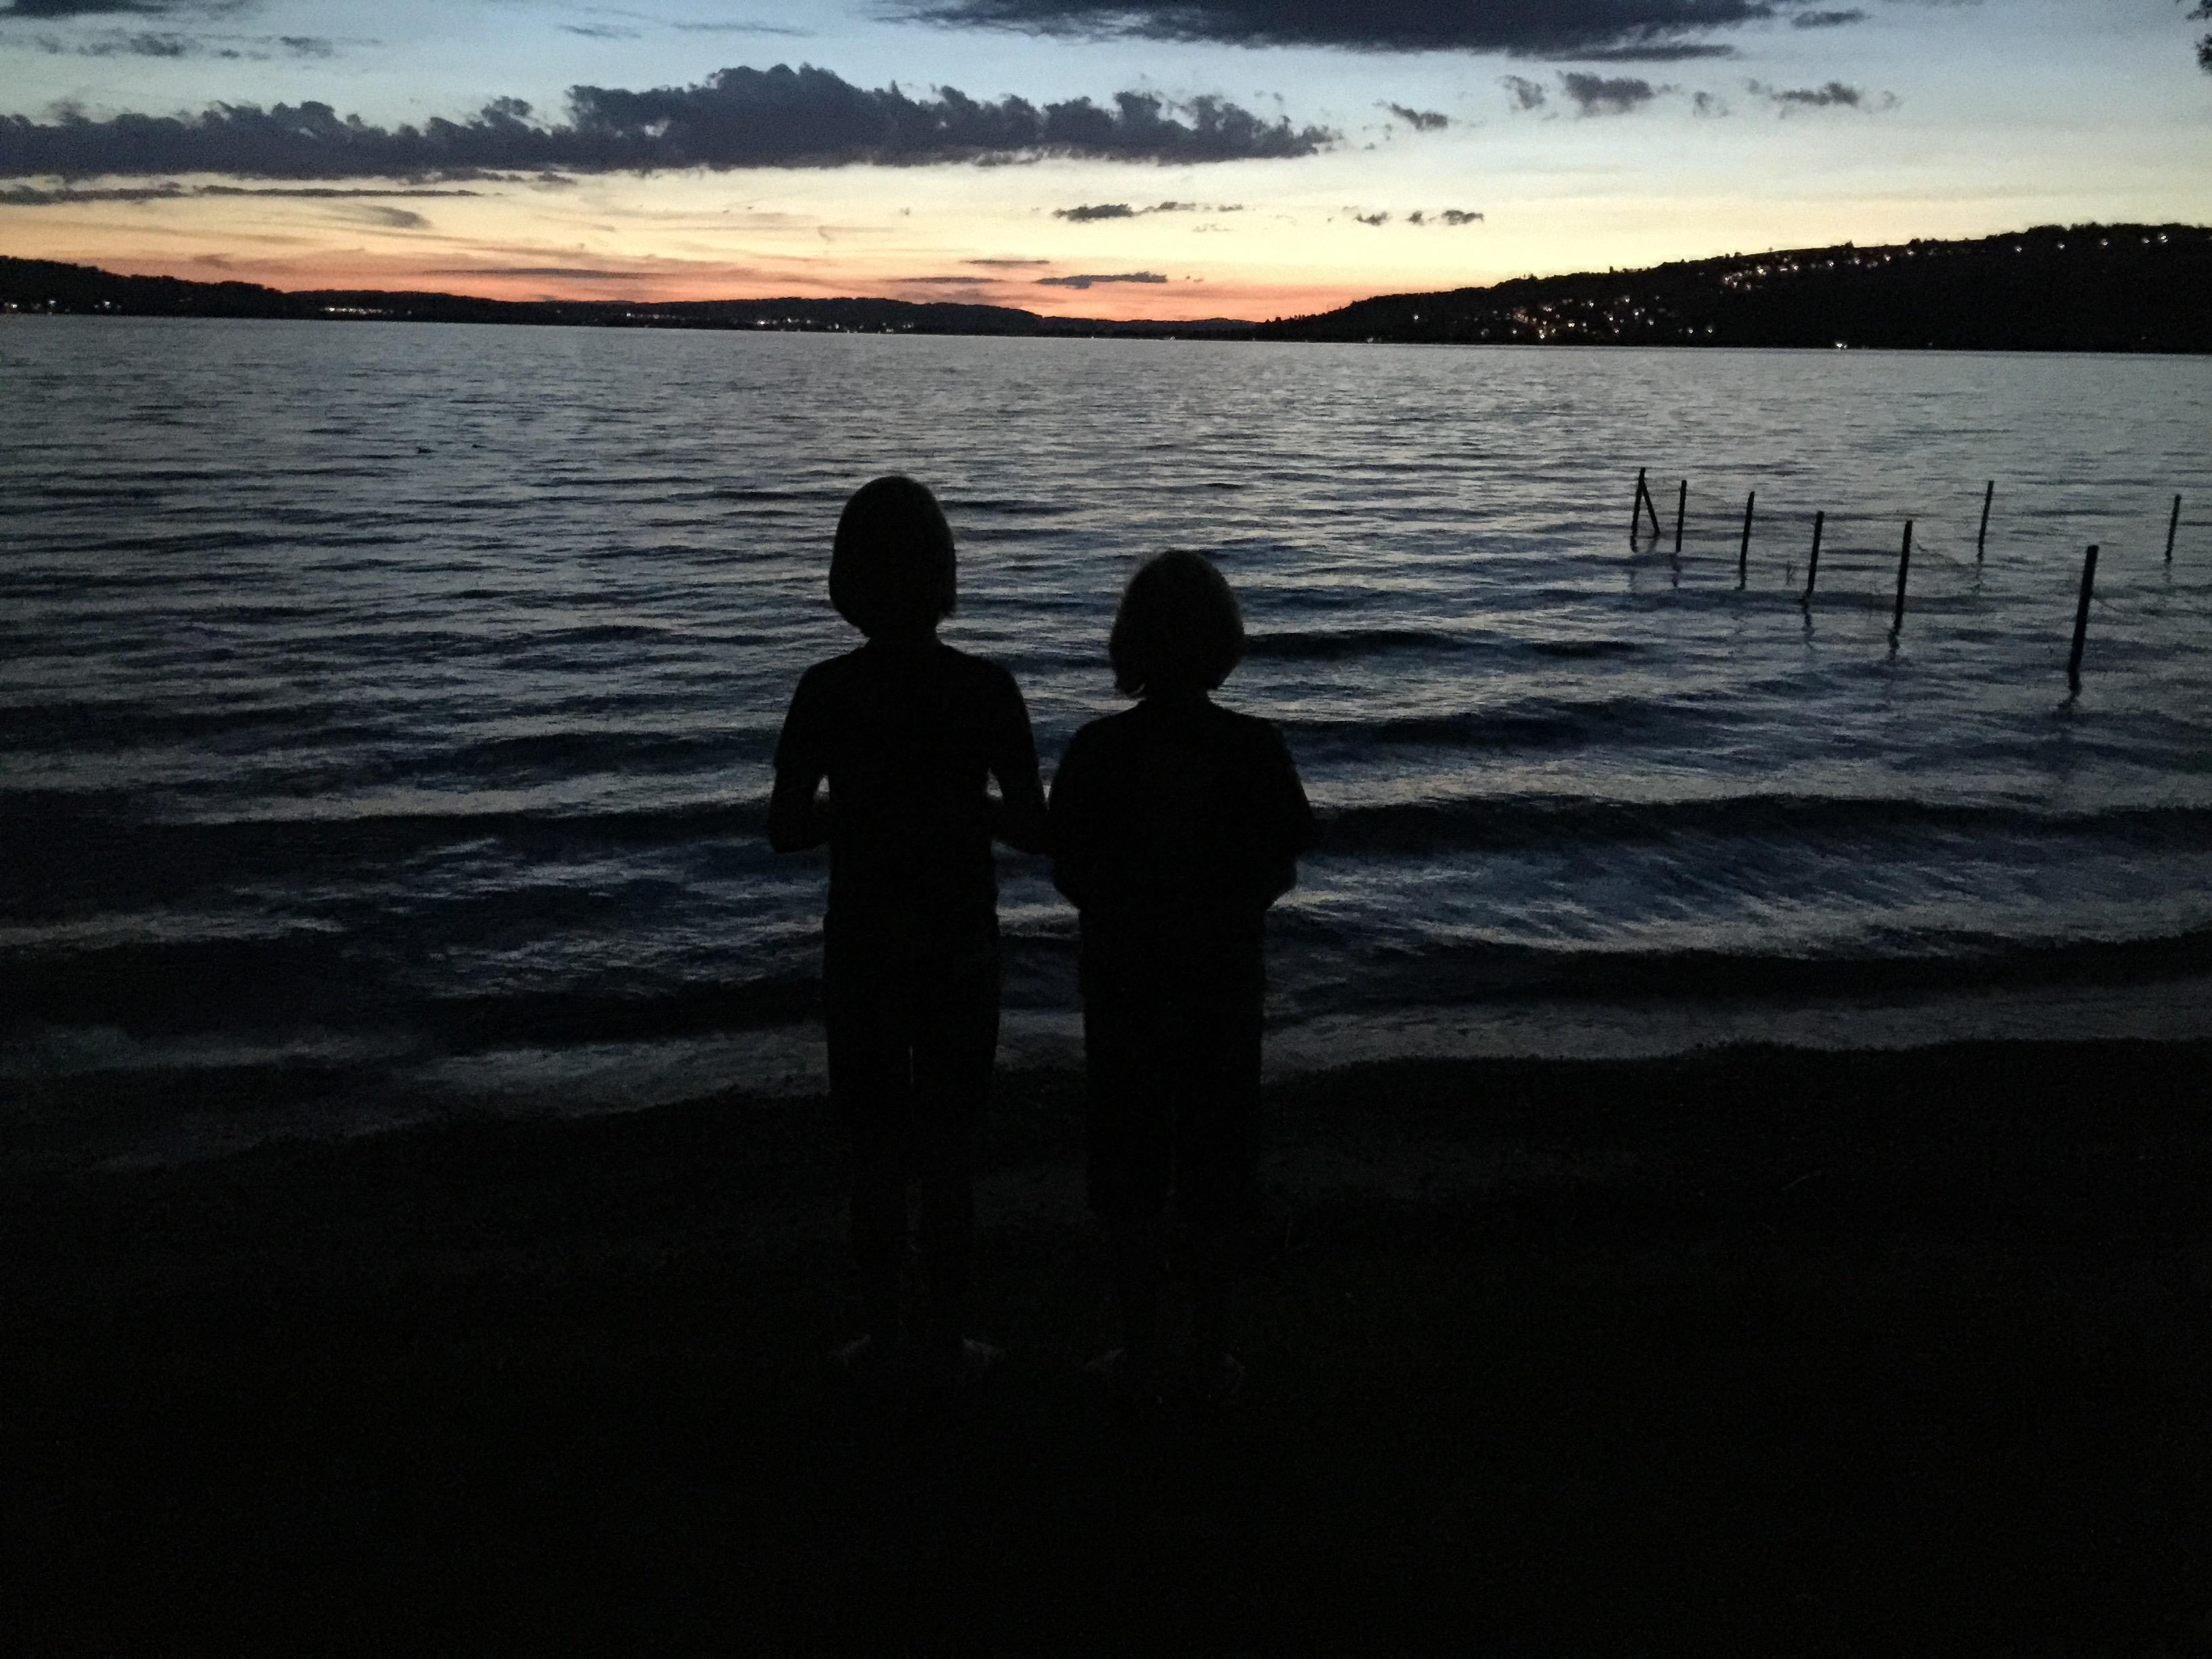 Lake Memories (our stories)